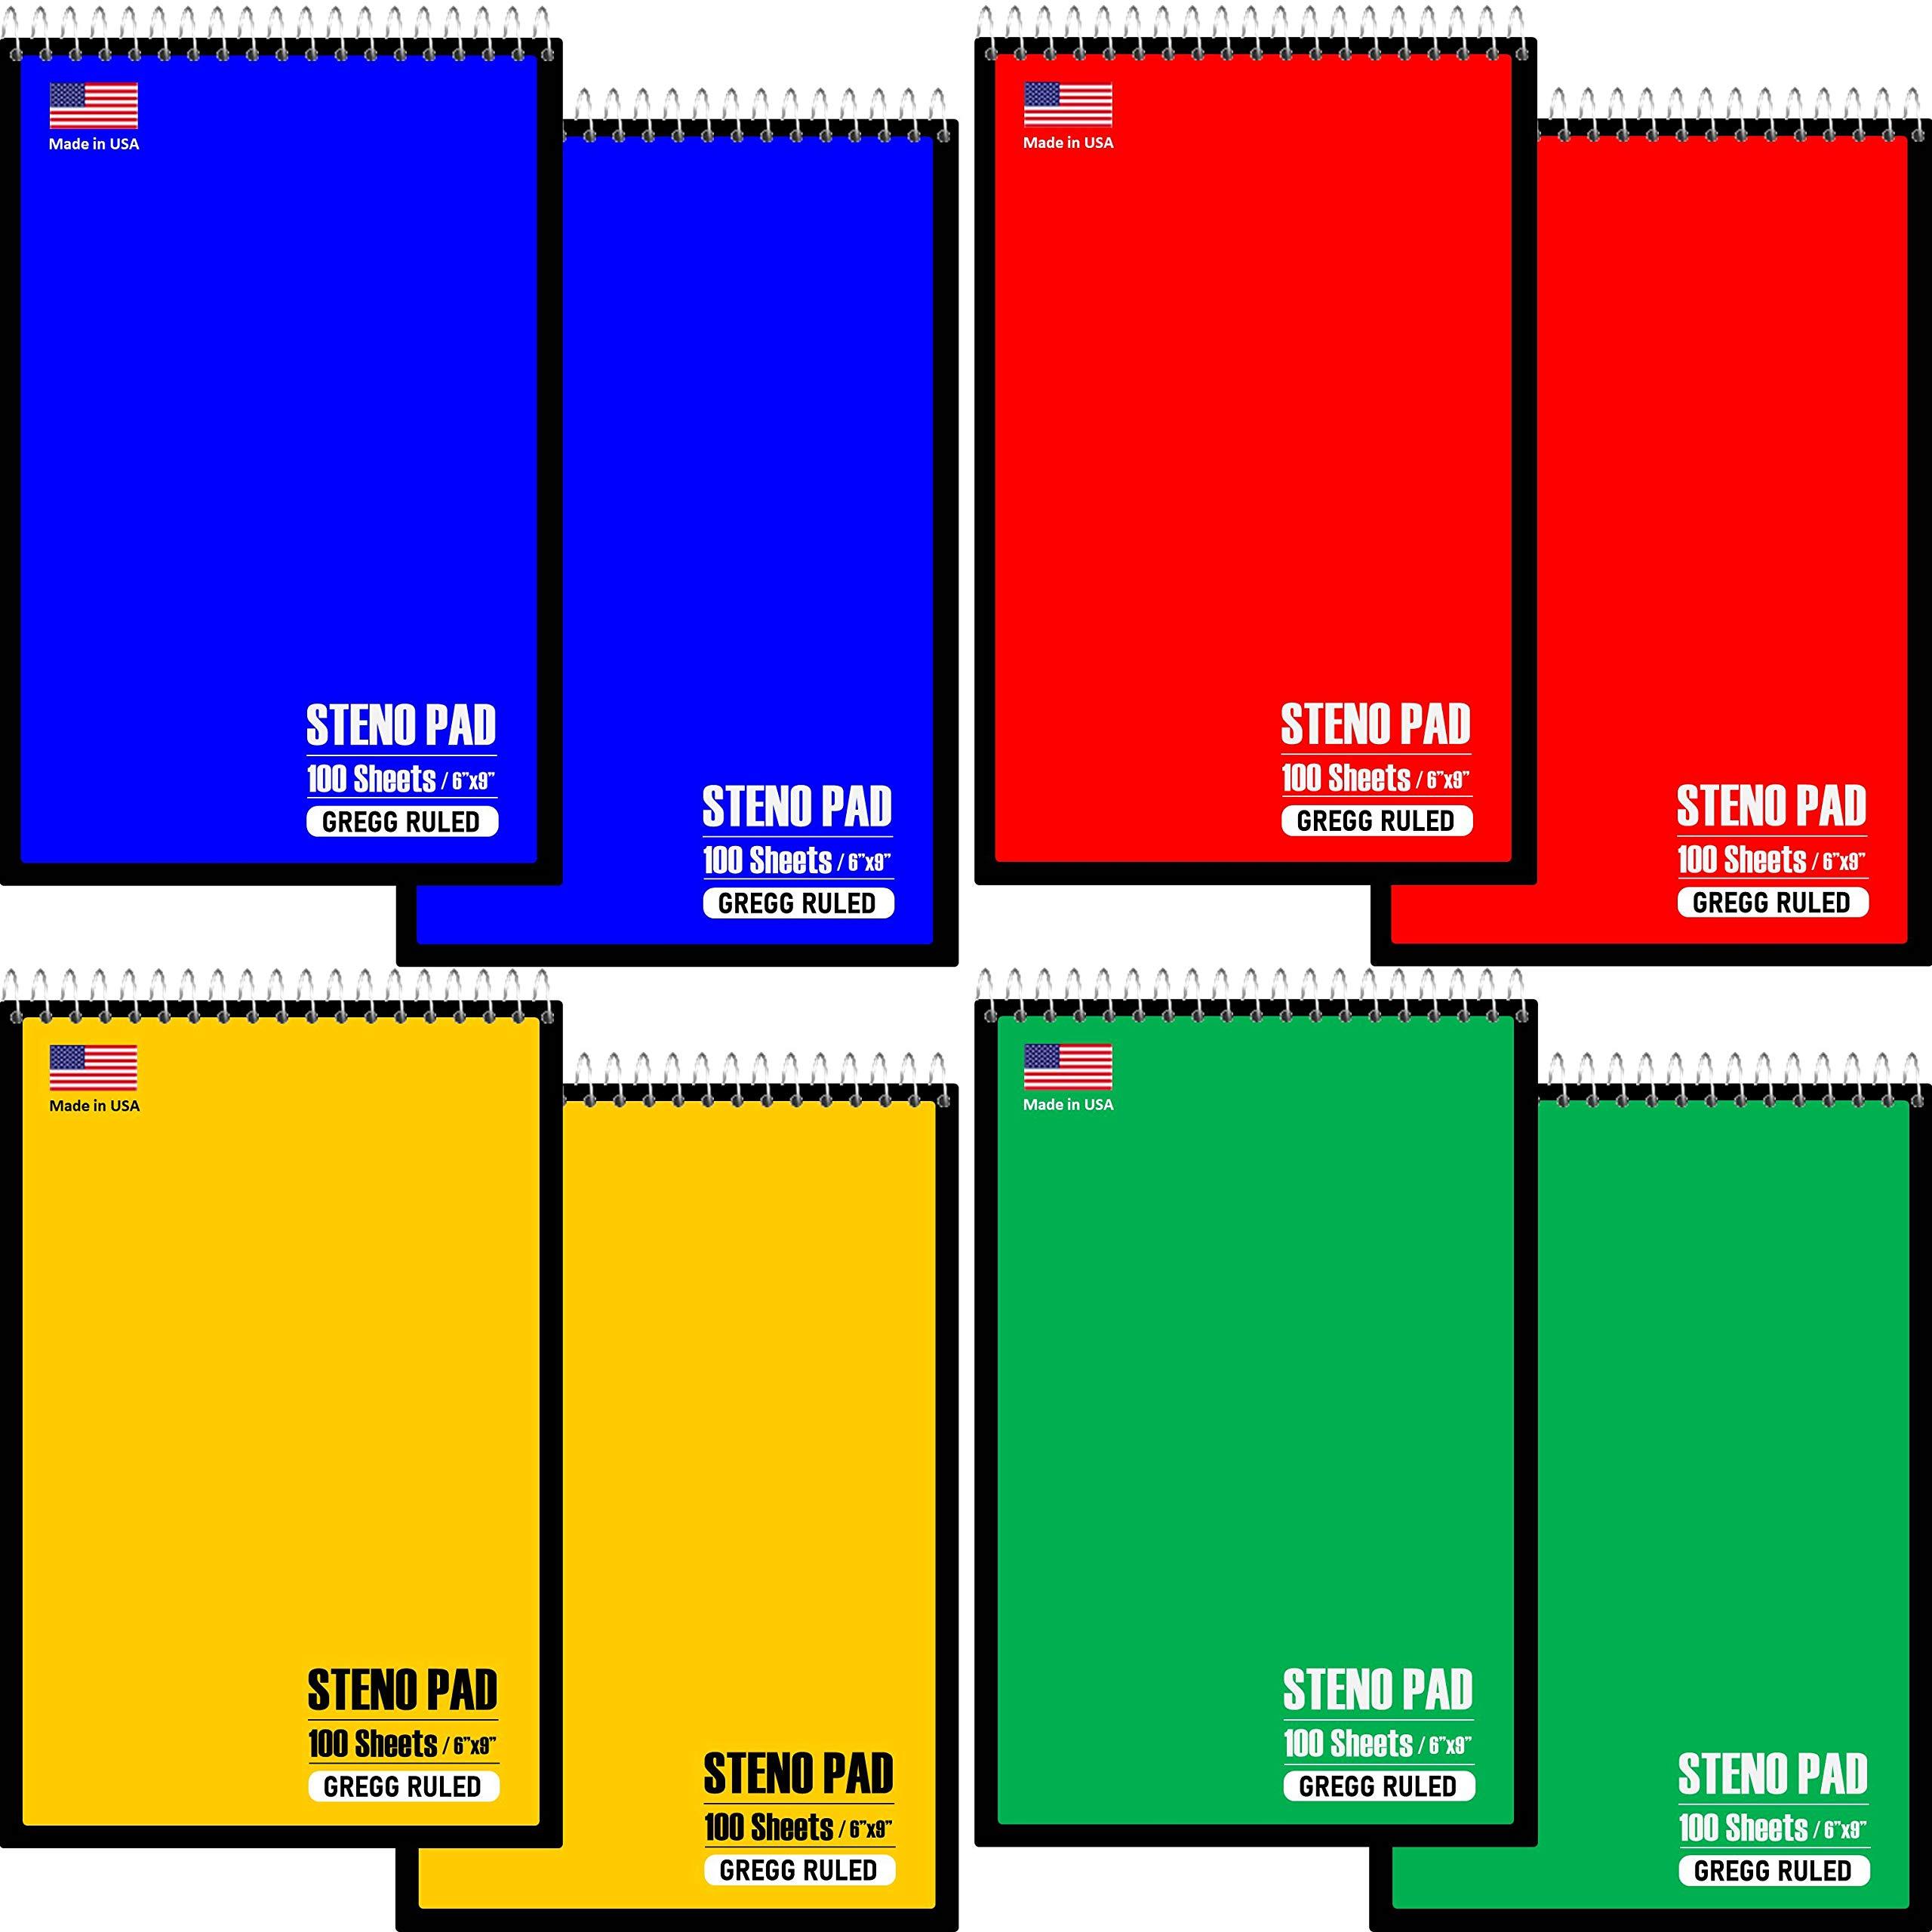 "Steno Pad - 100 Sheets 6"" X 9"" Gregg Ruled"